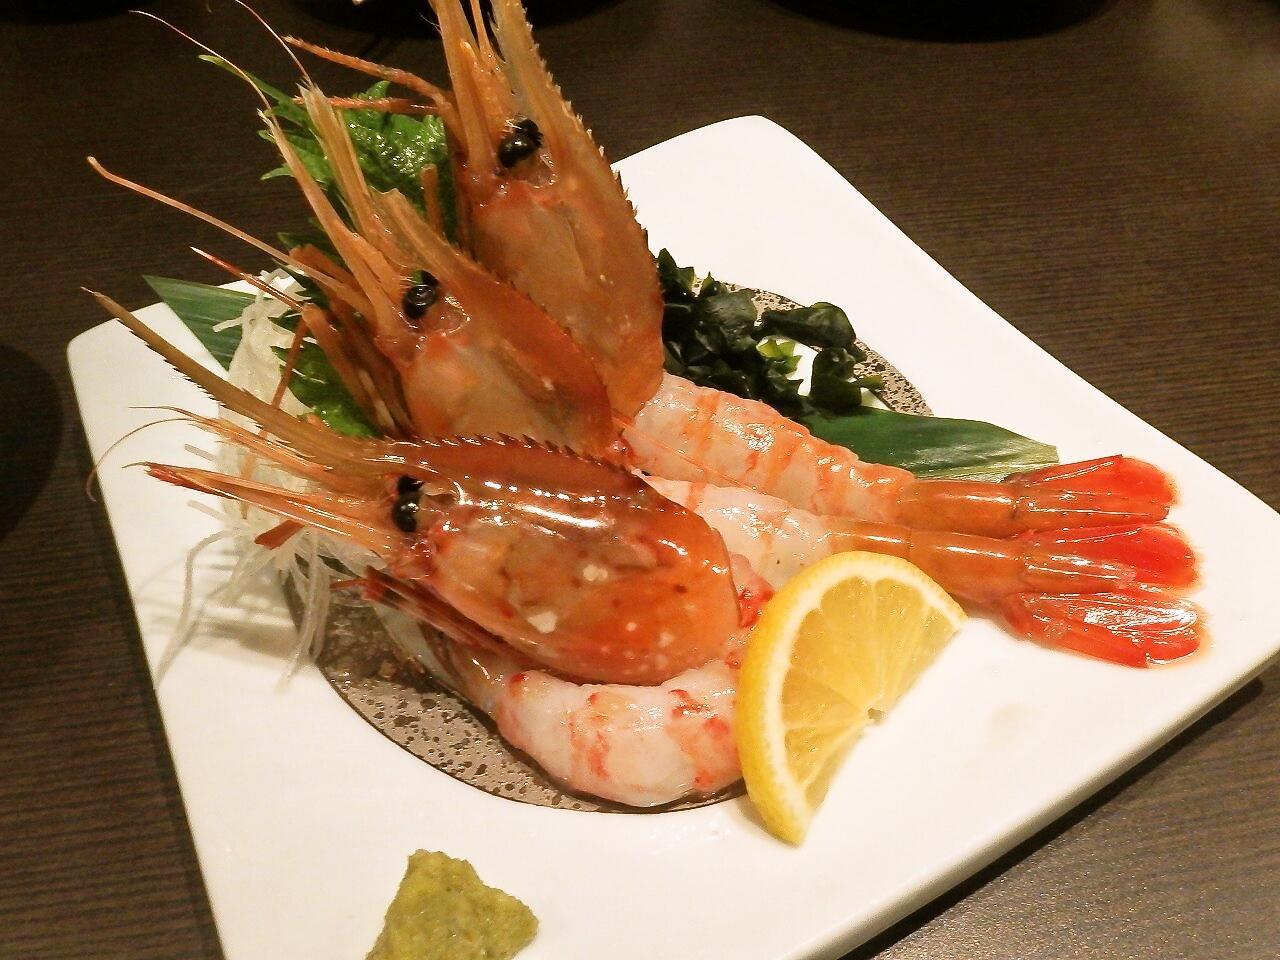 foodpic7525232.jpg